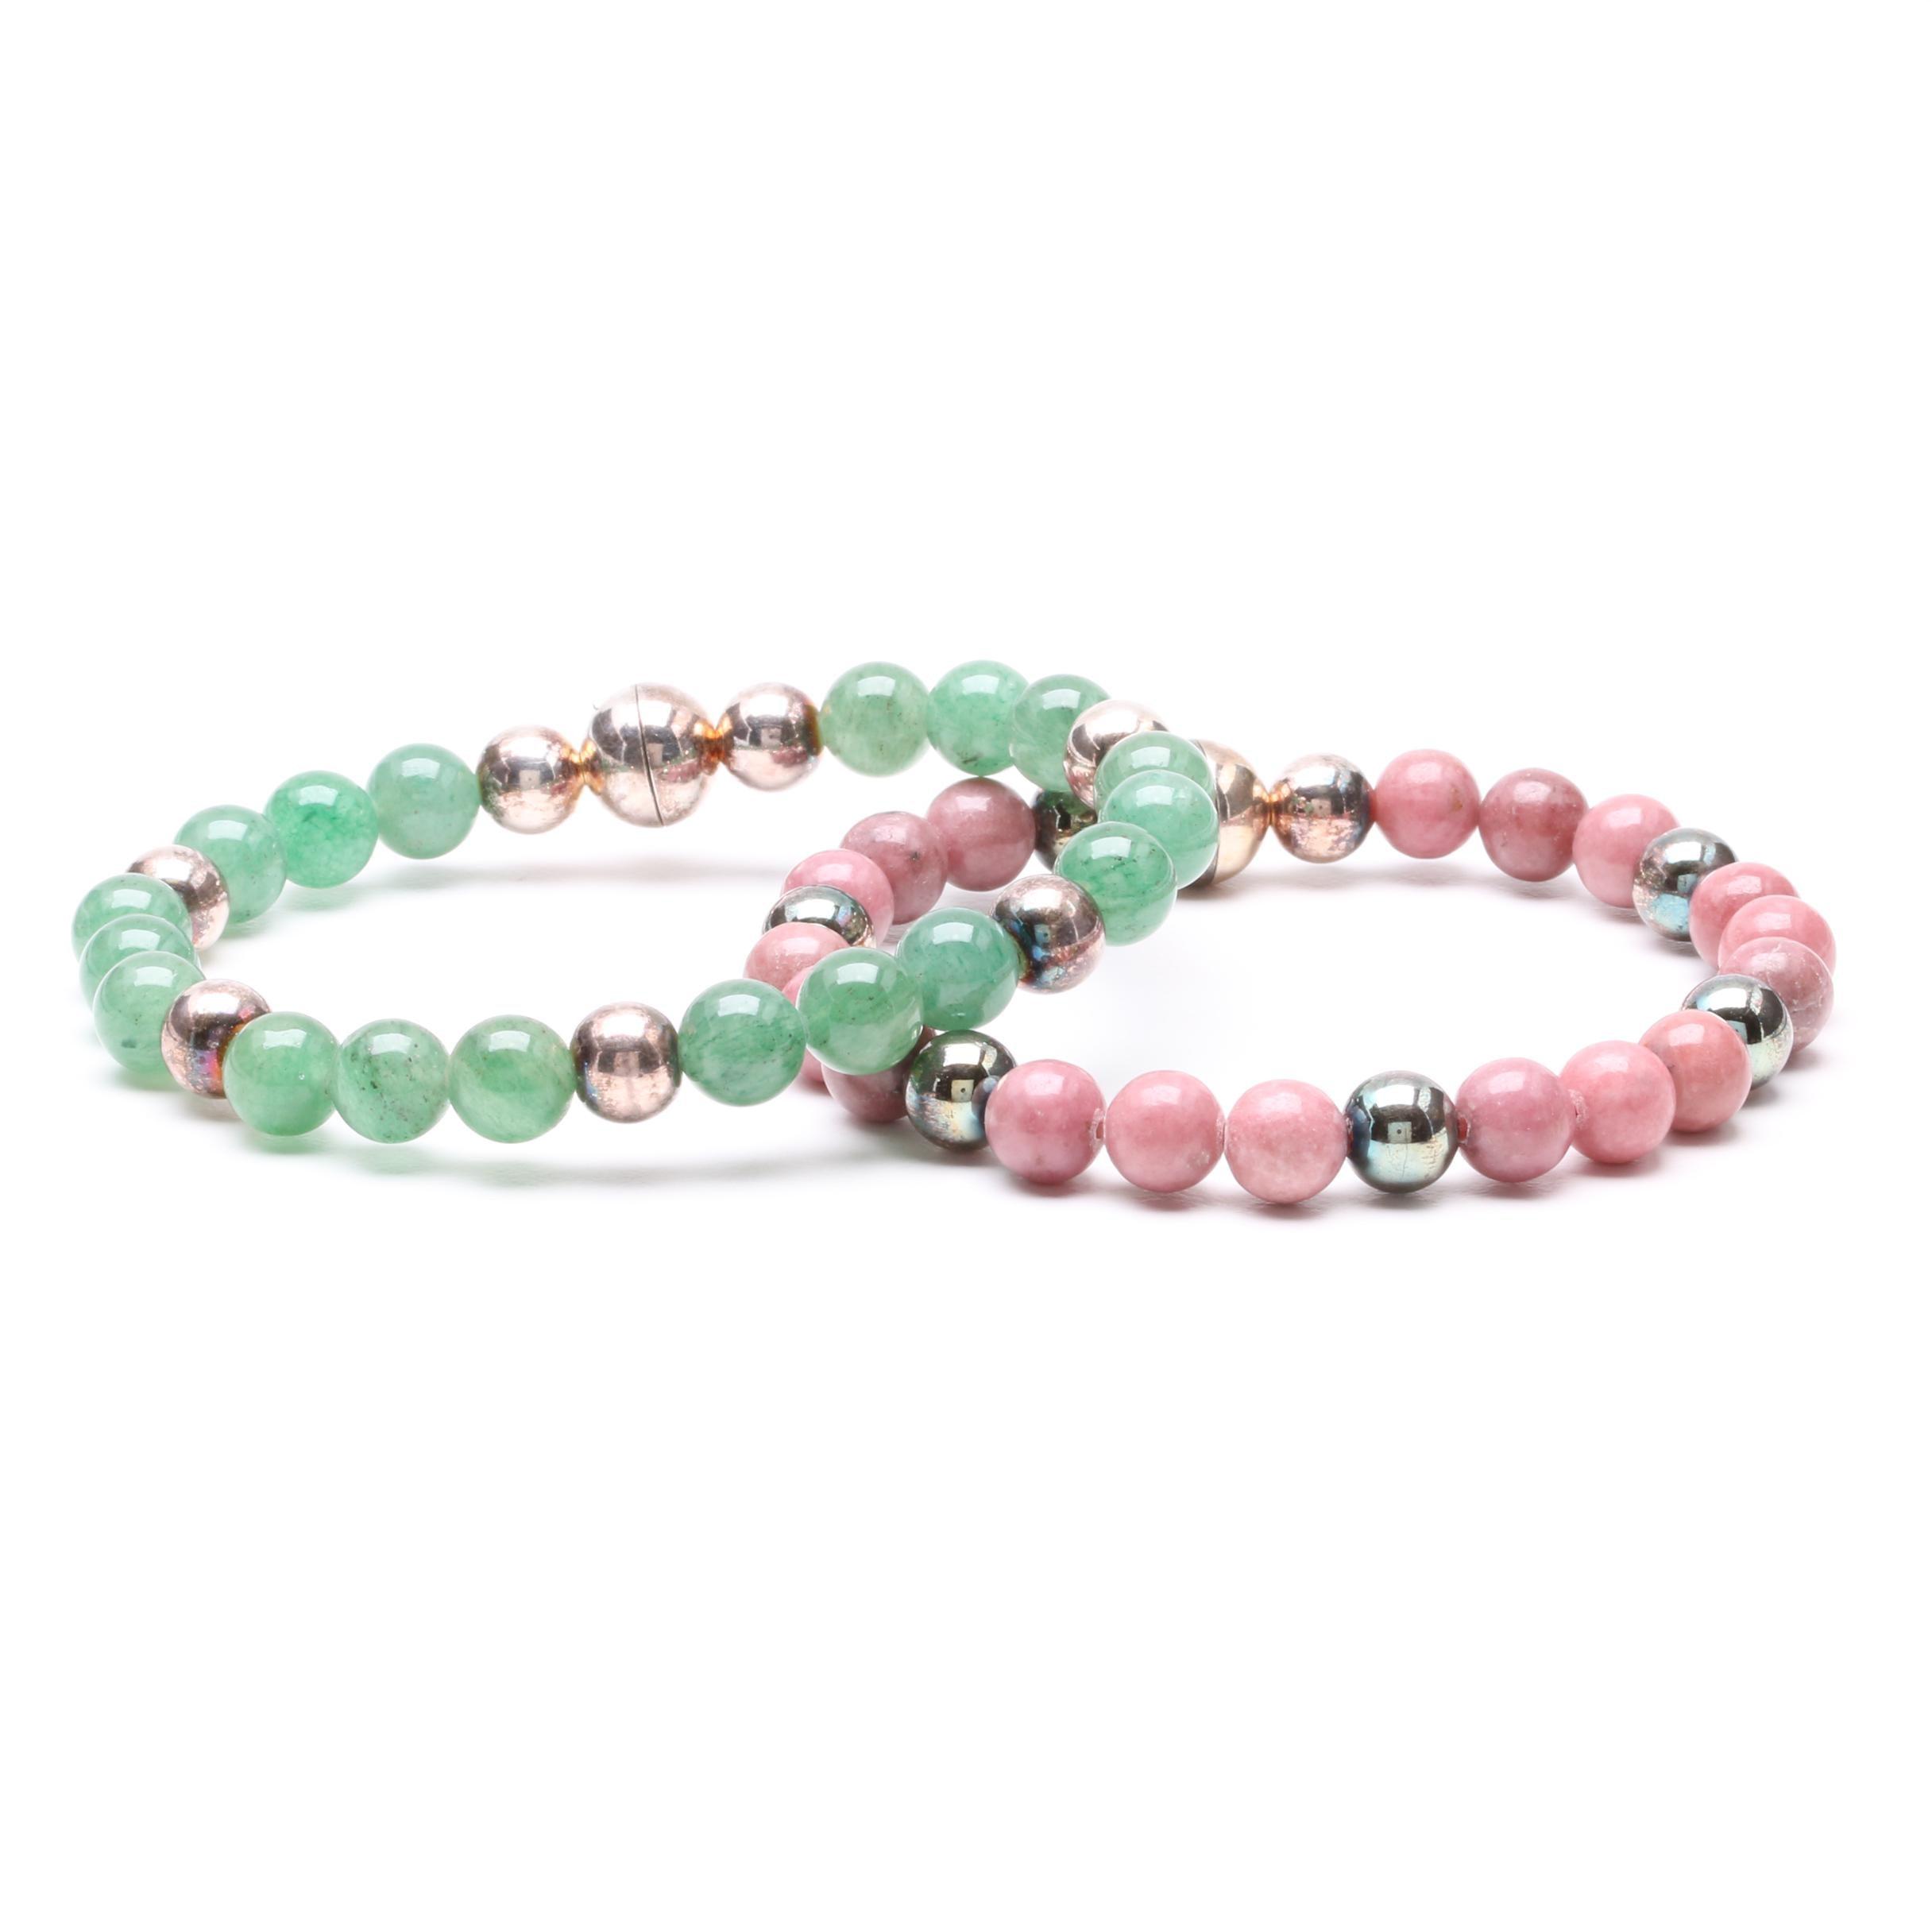 Milor Sterling Silver Aventurine and Rhodonite Beaded Bracelets